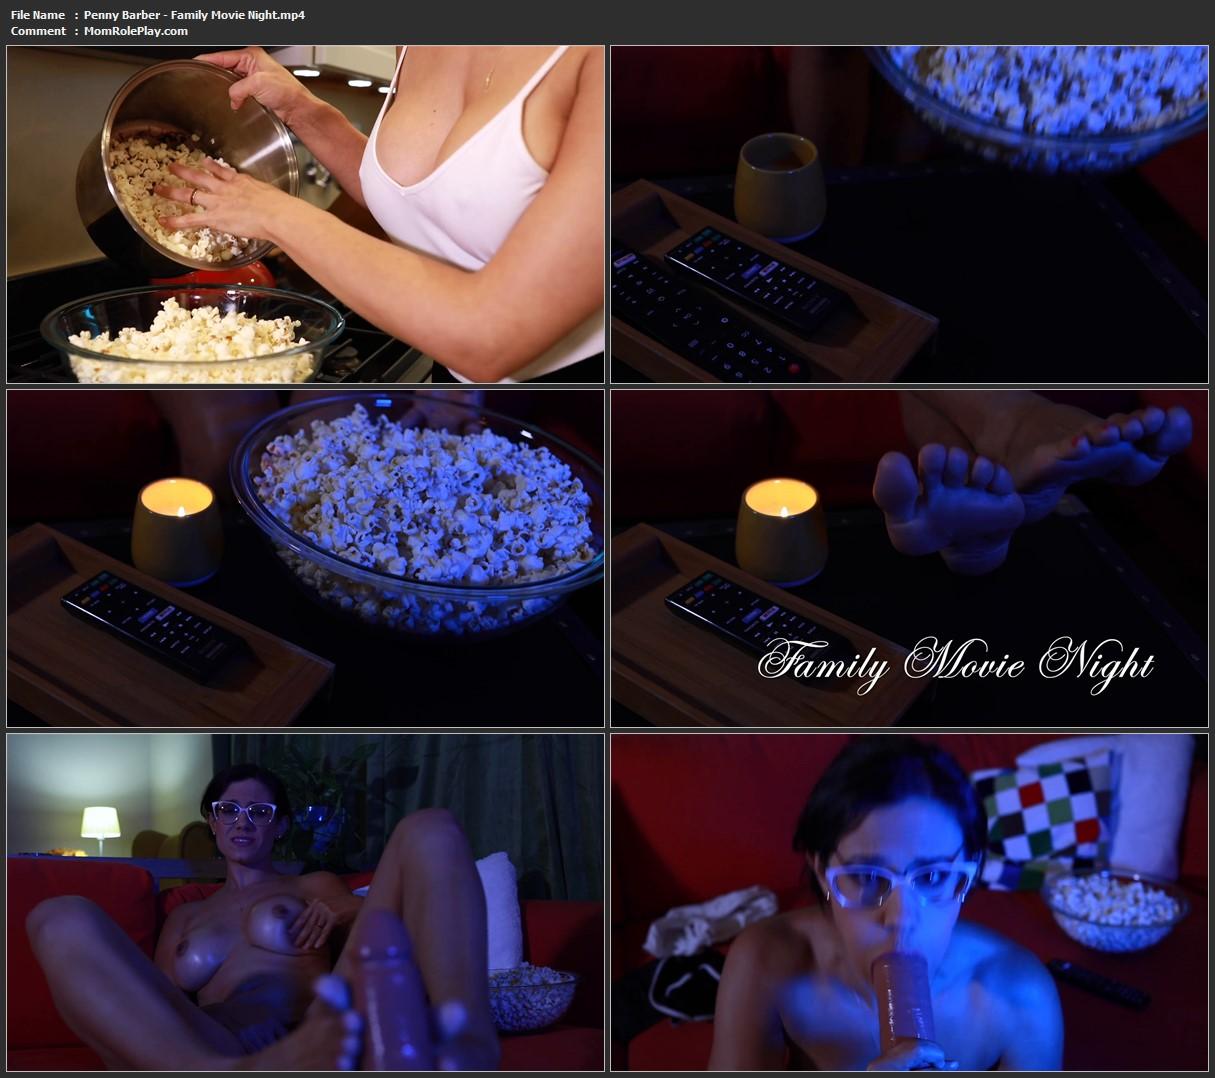 Penny Barber - Family Movie Night